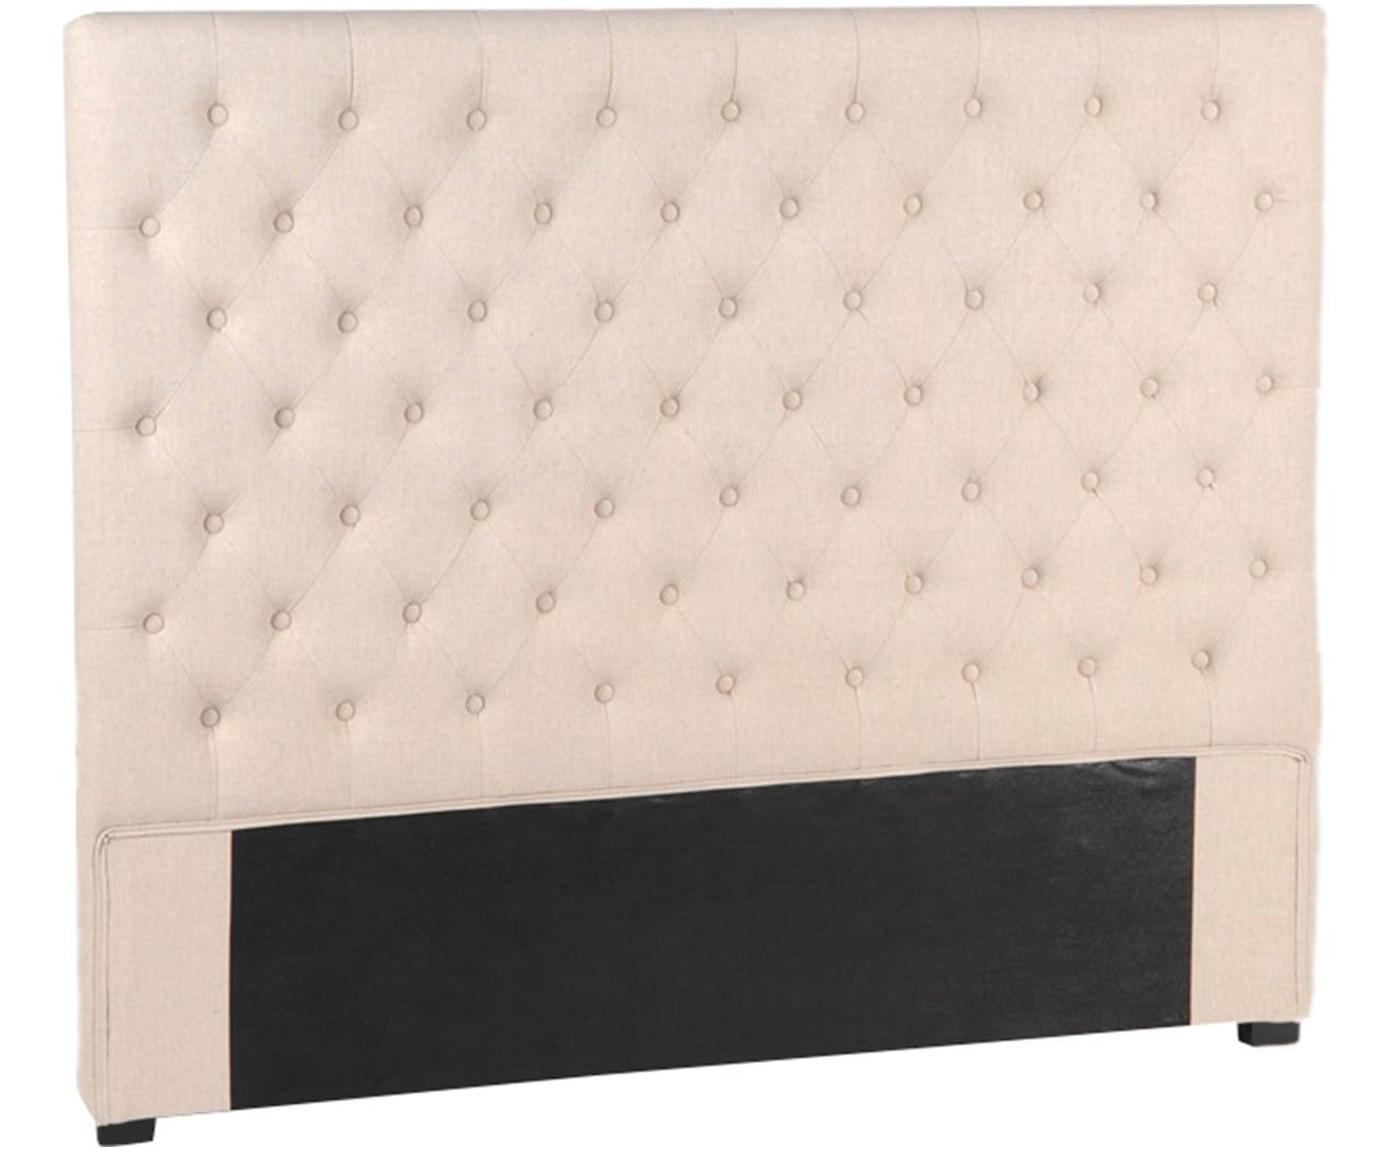 Cabecero Lino, Estructura: madera de bayur, tablero , Tapizado: algodón, poliéster, Beige, An 160 x Al 120 cm